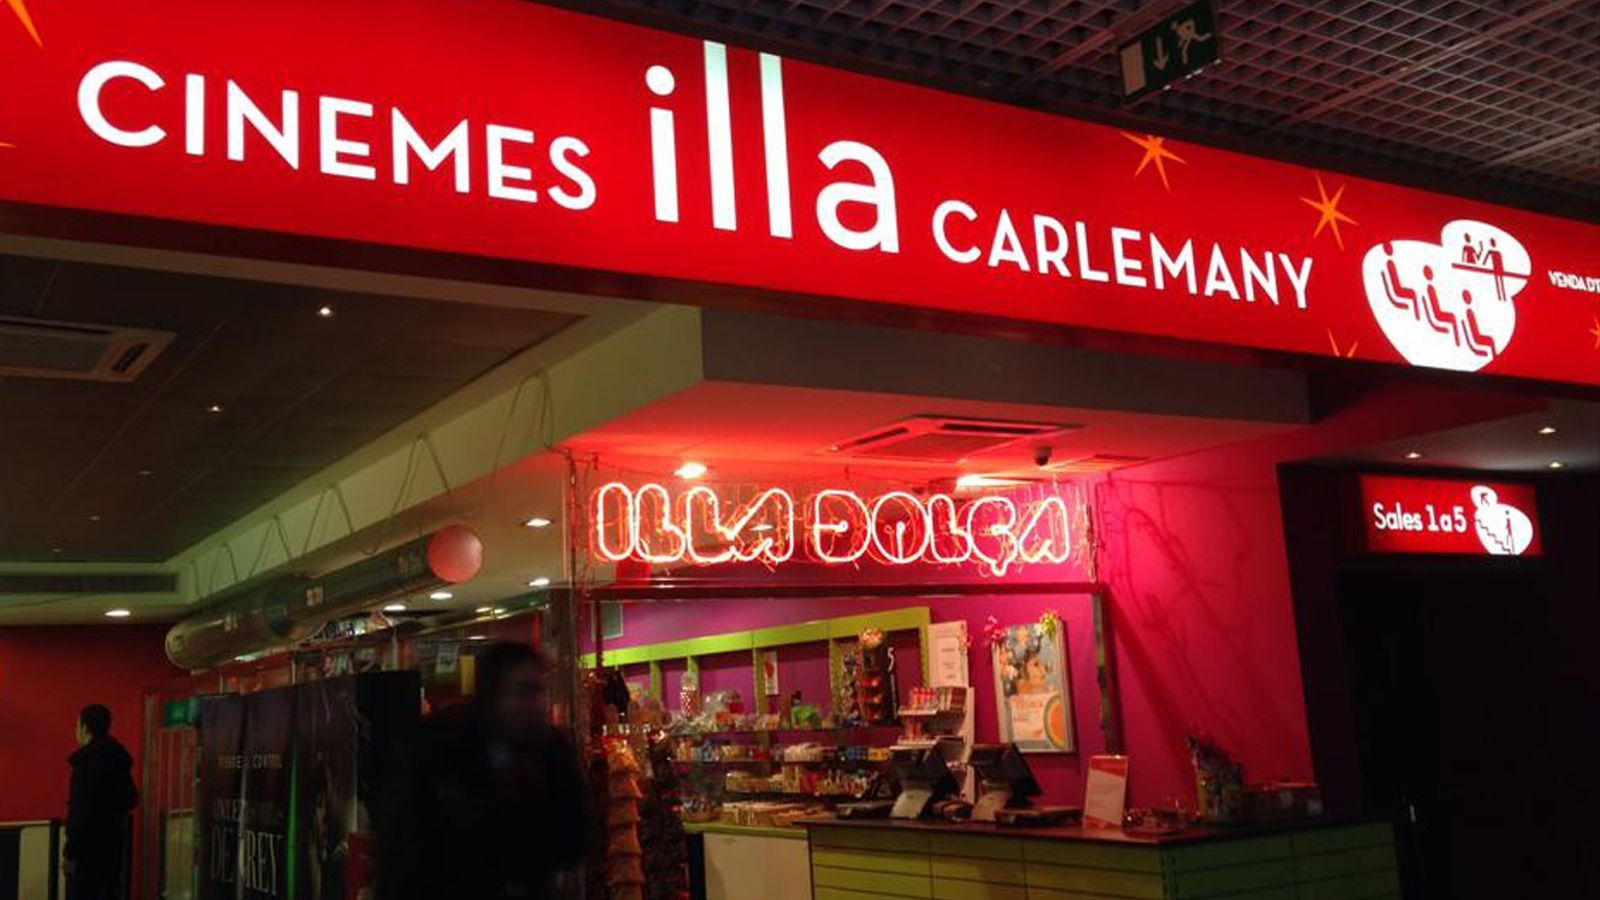 Els cinemes illa Carlemany. / ARXIU